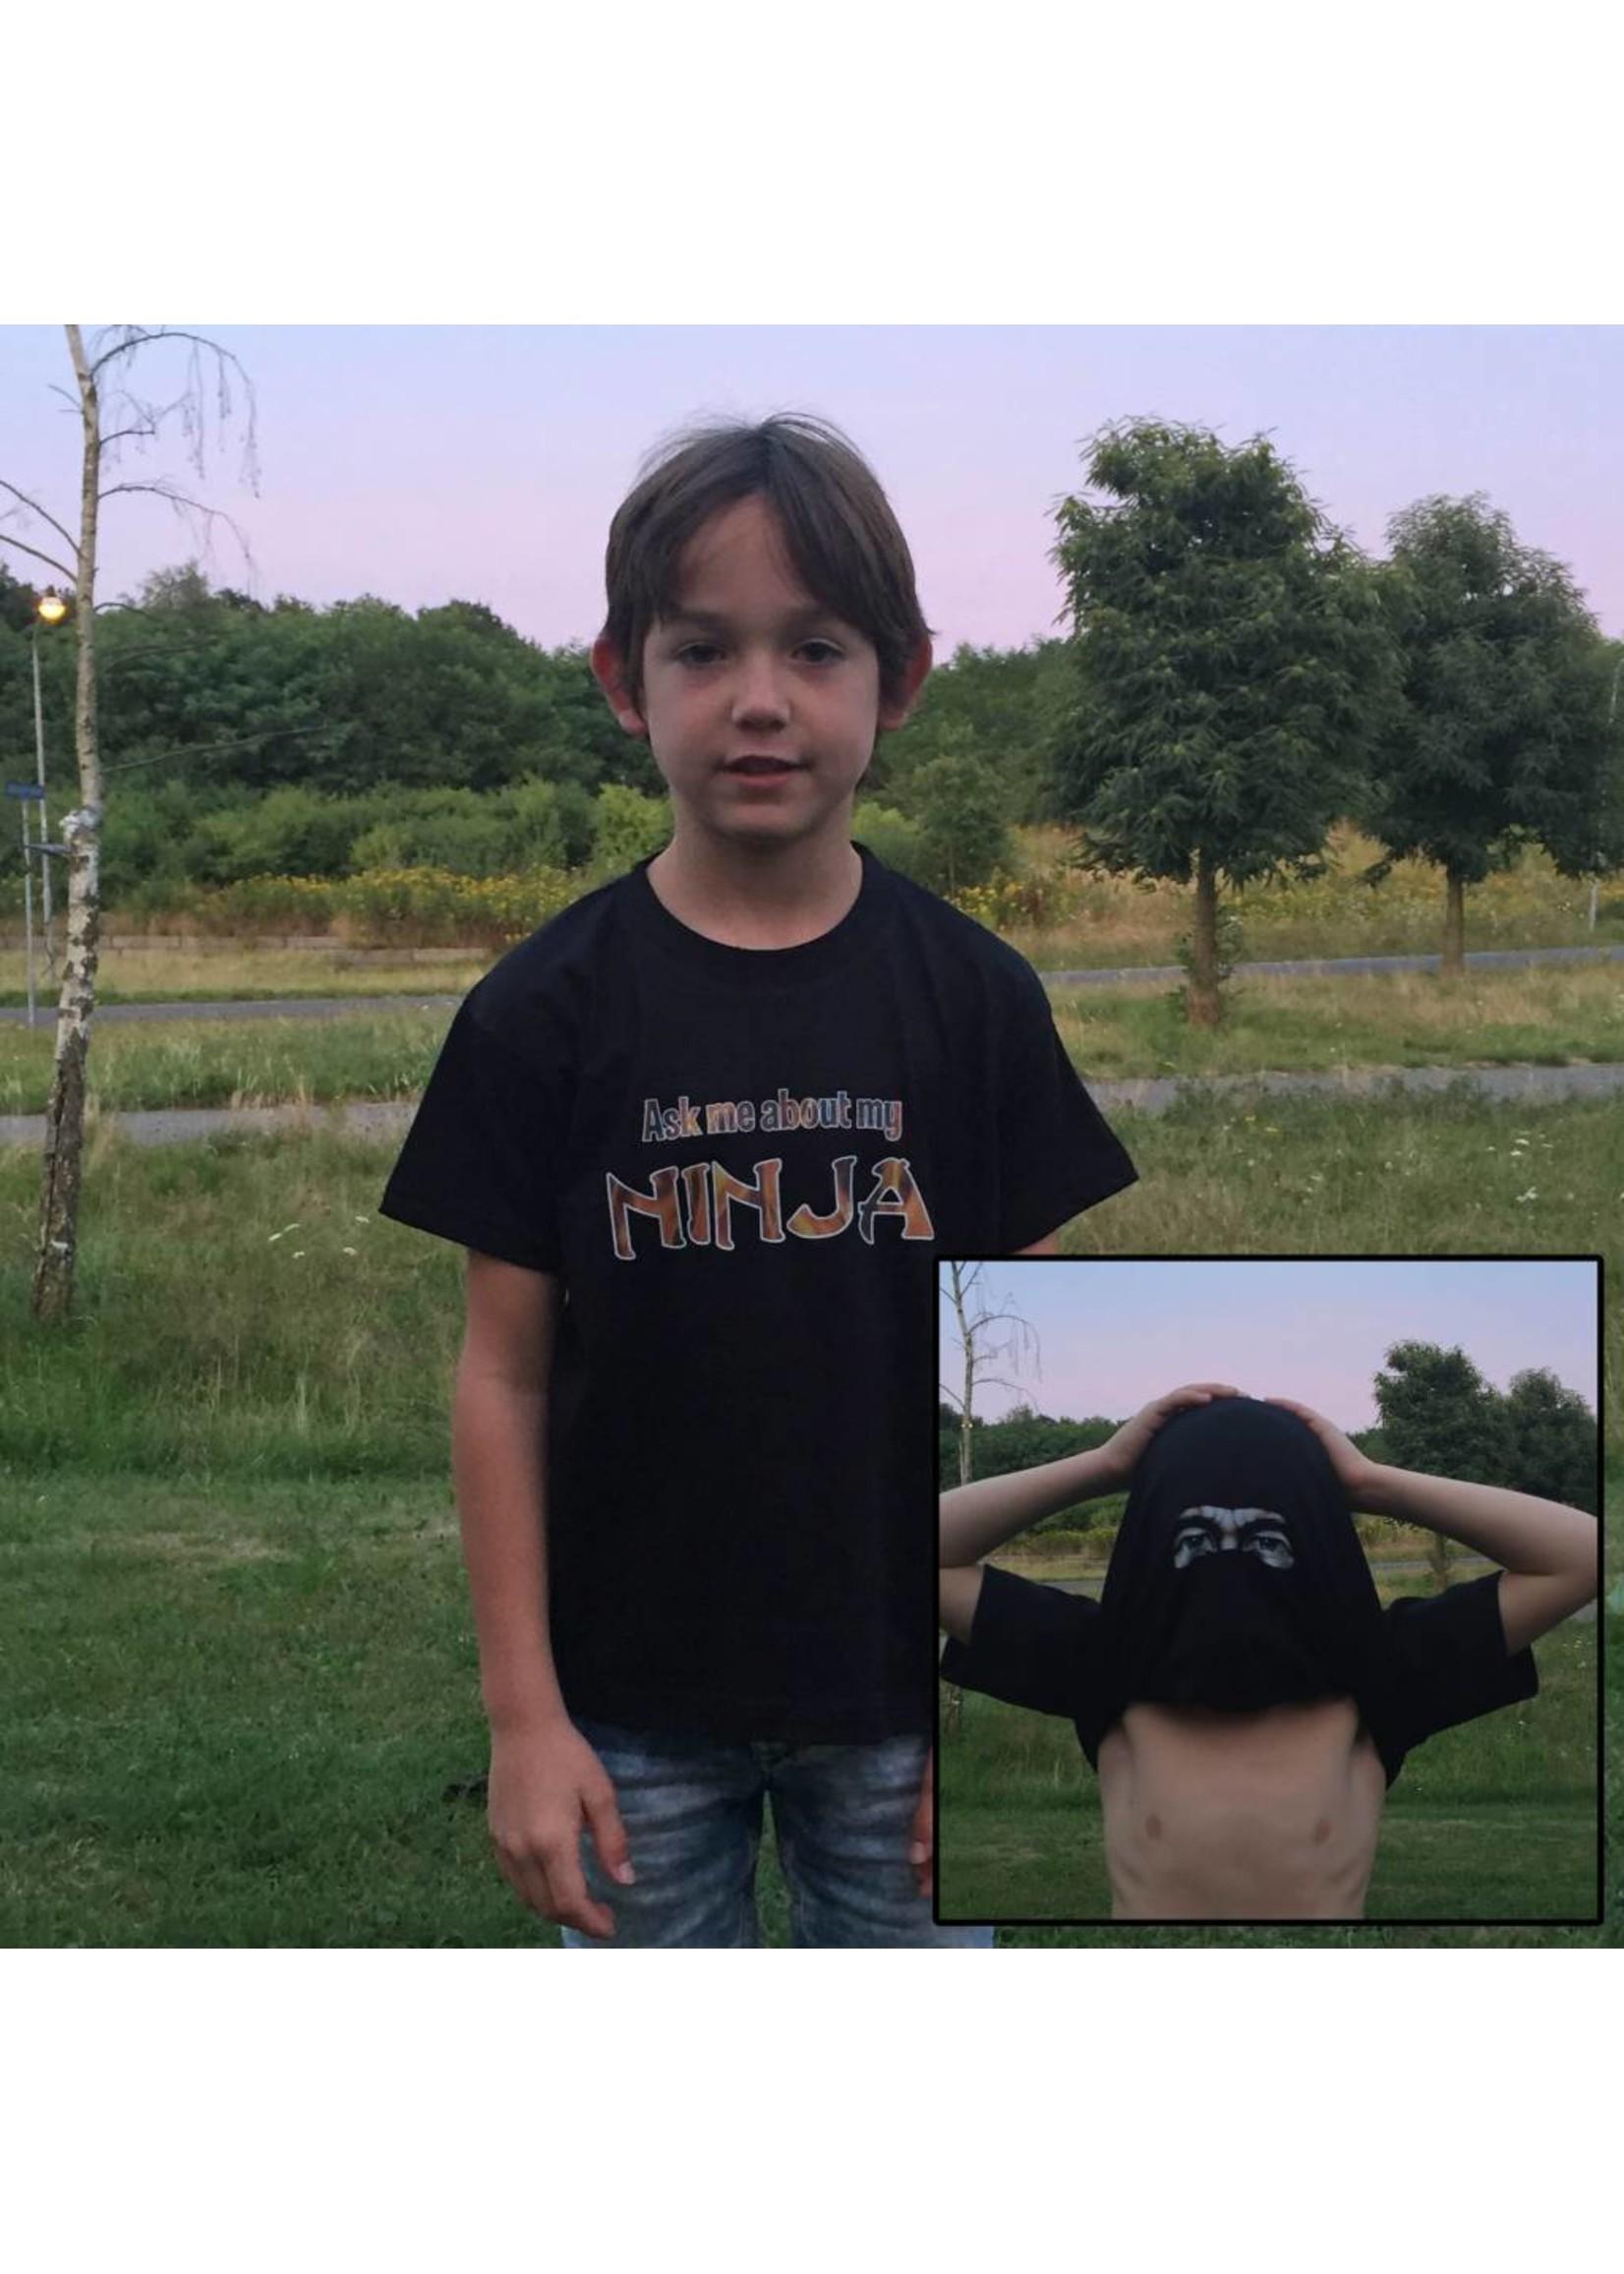 T-shirt ask me about my ninja